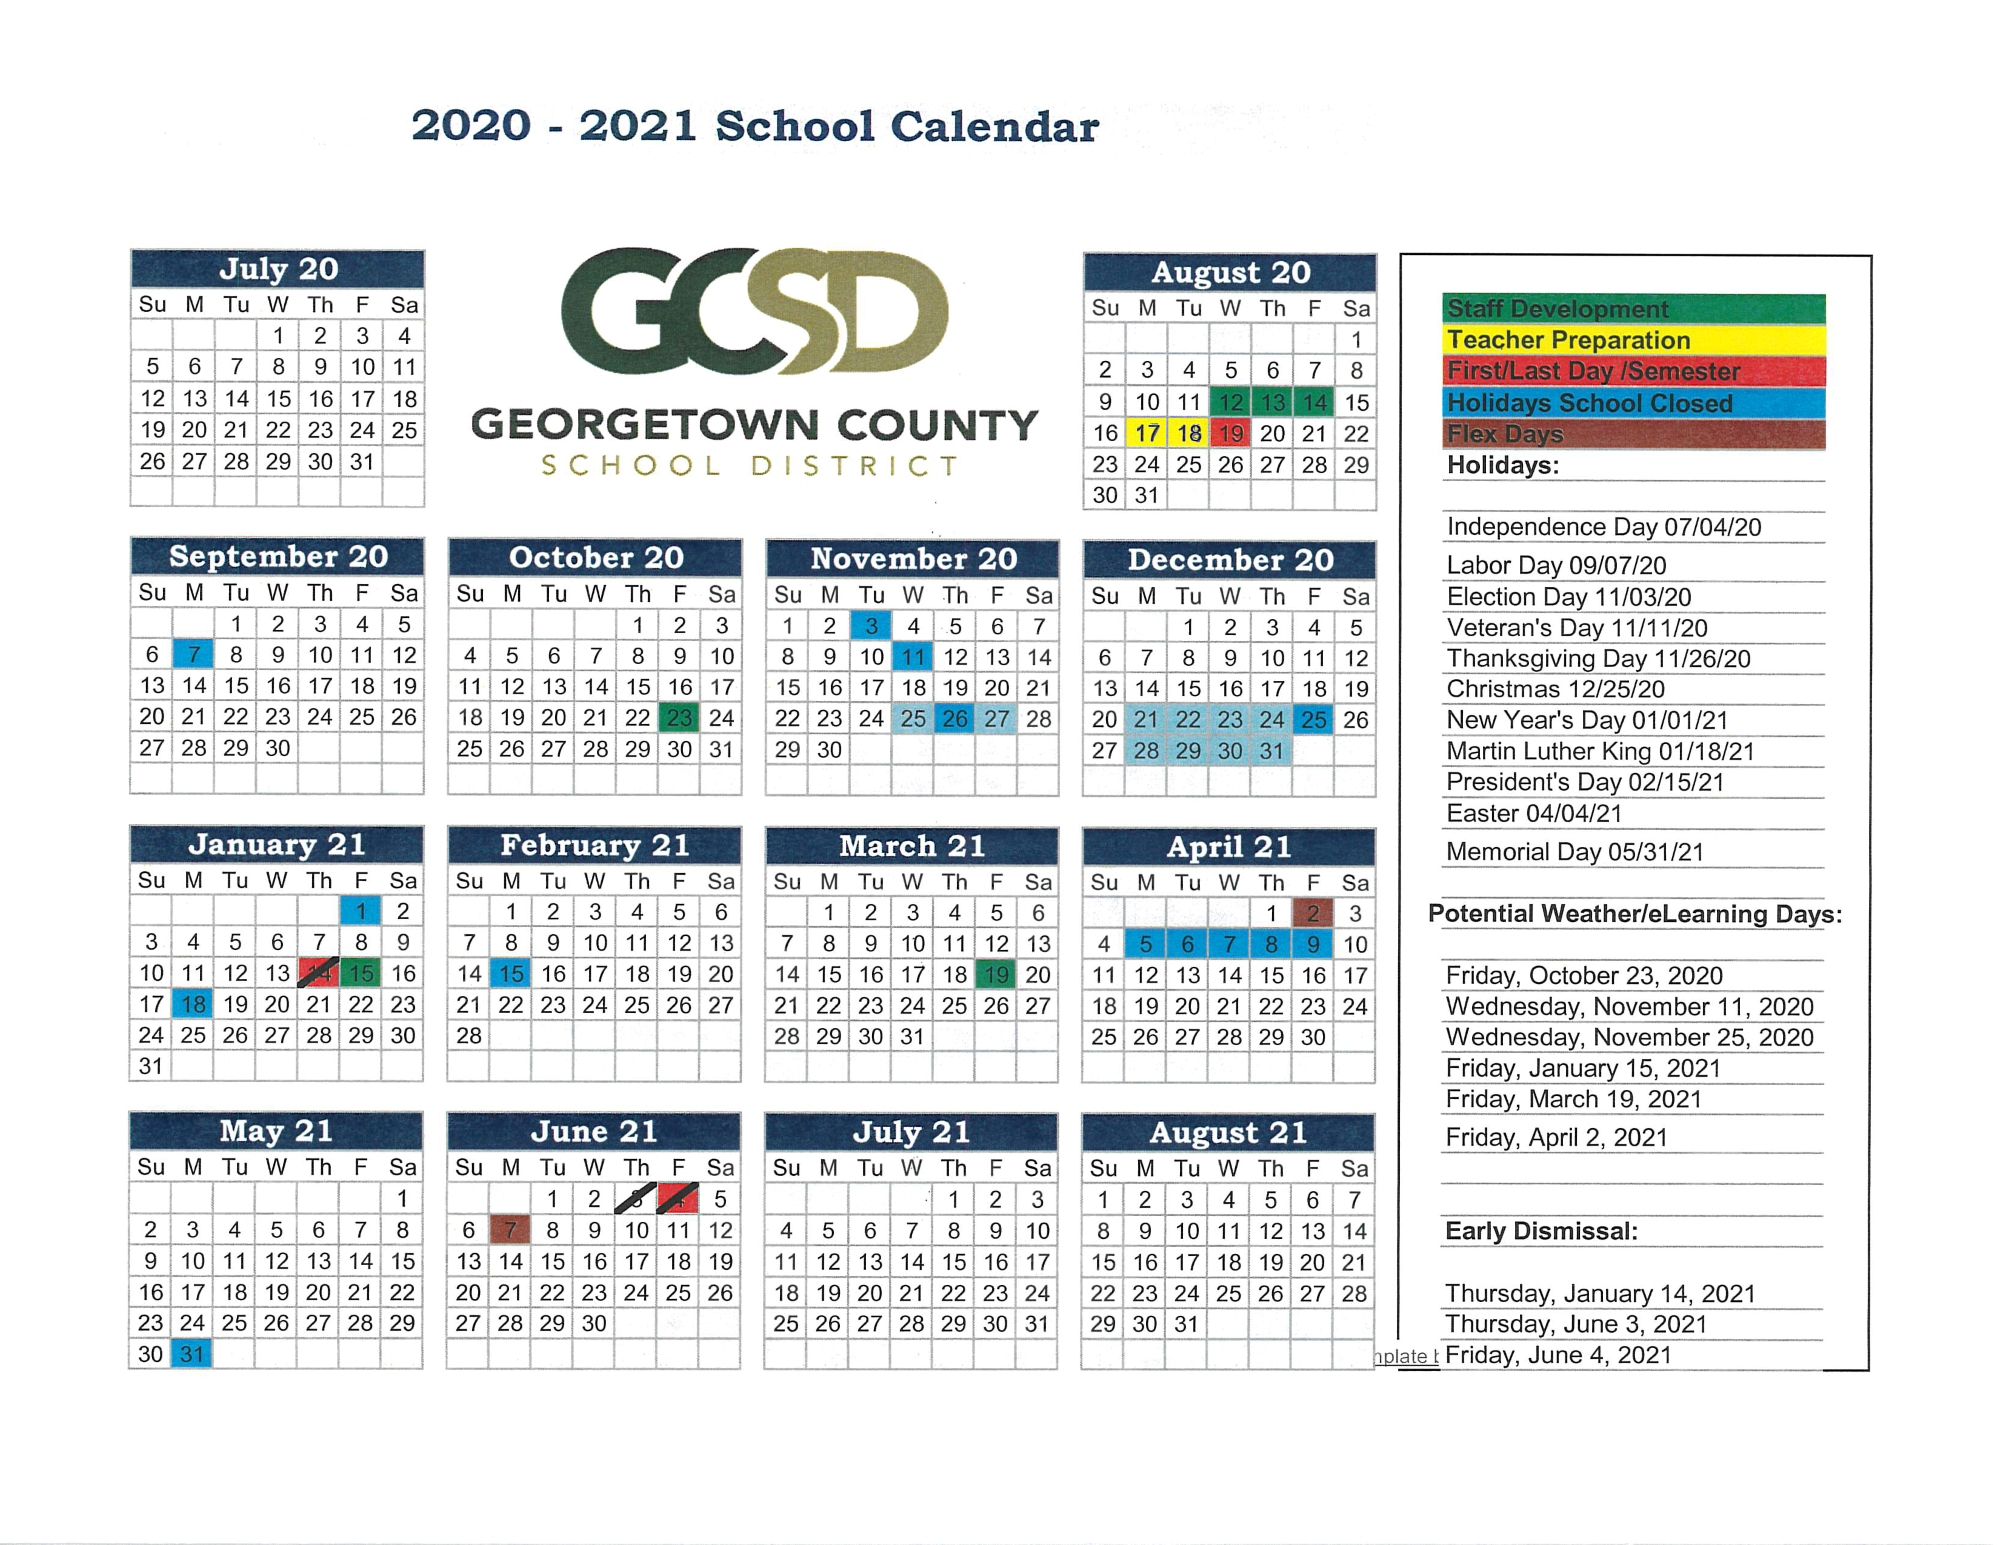 2020-2021 School Year Calendar - Georgetown County School pertaining to Georgetown County School District Calendar